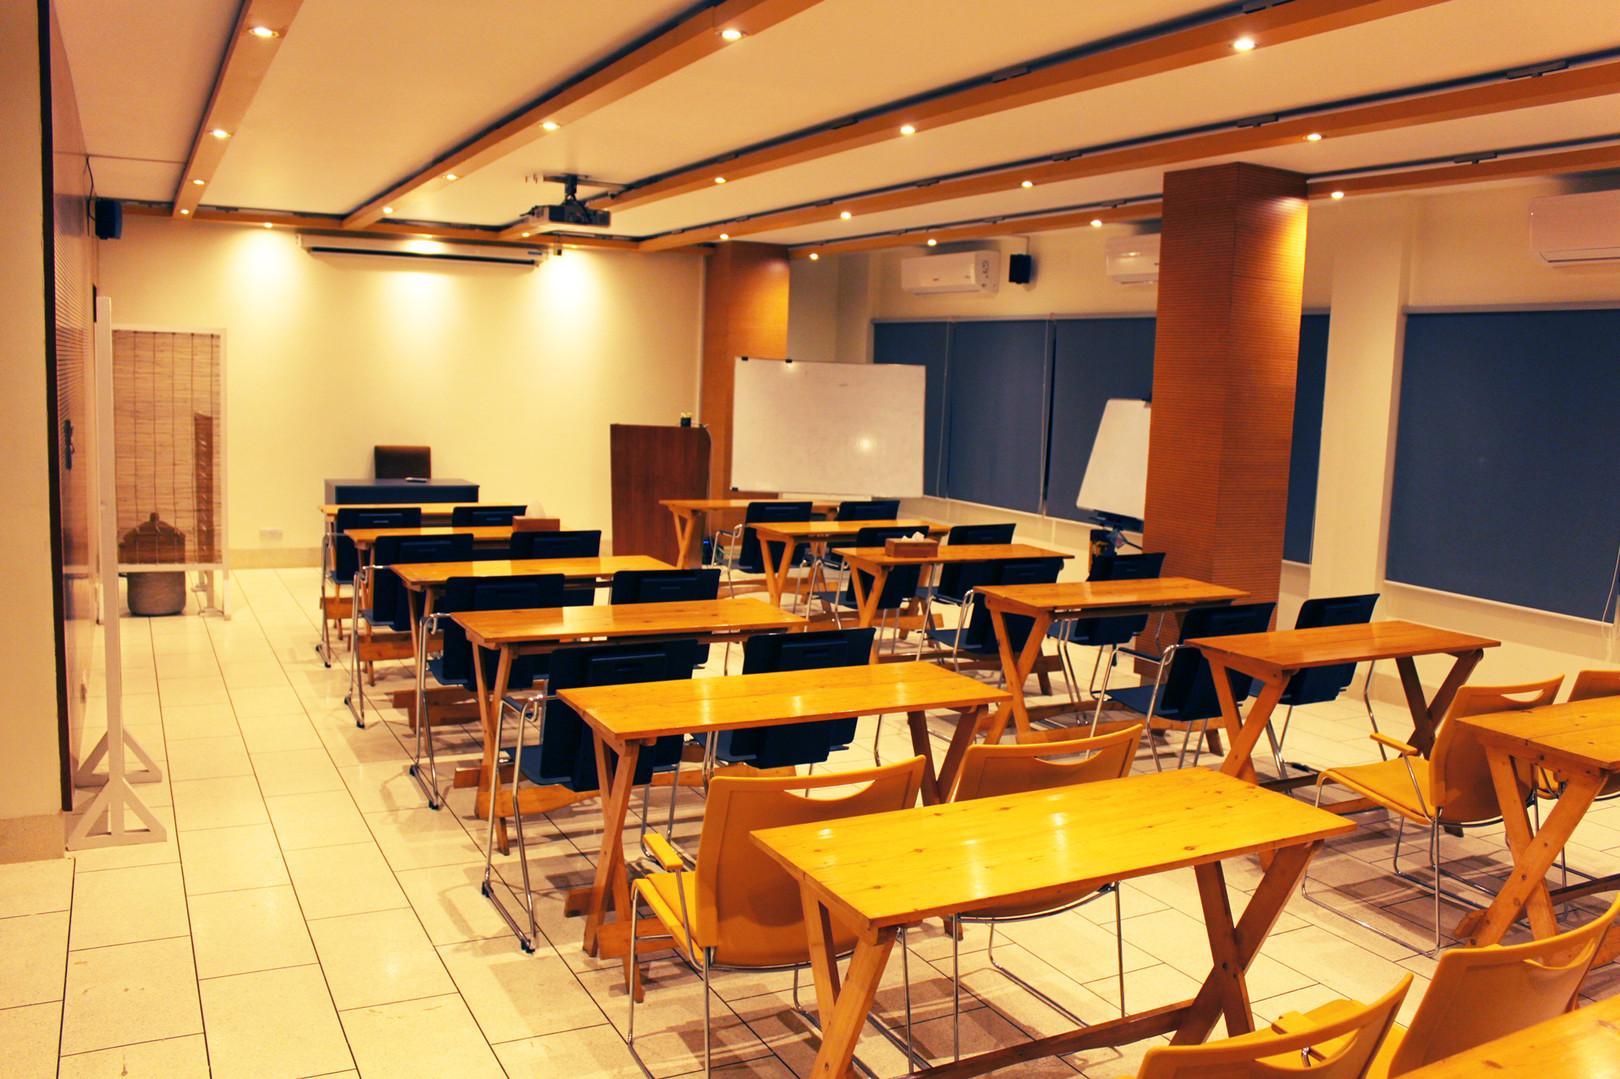 Classroom_4.jpg